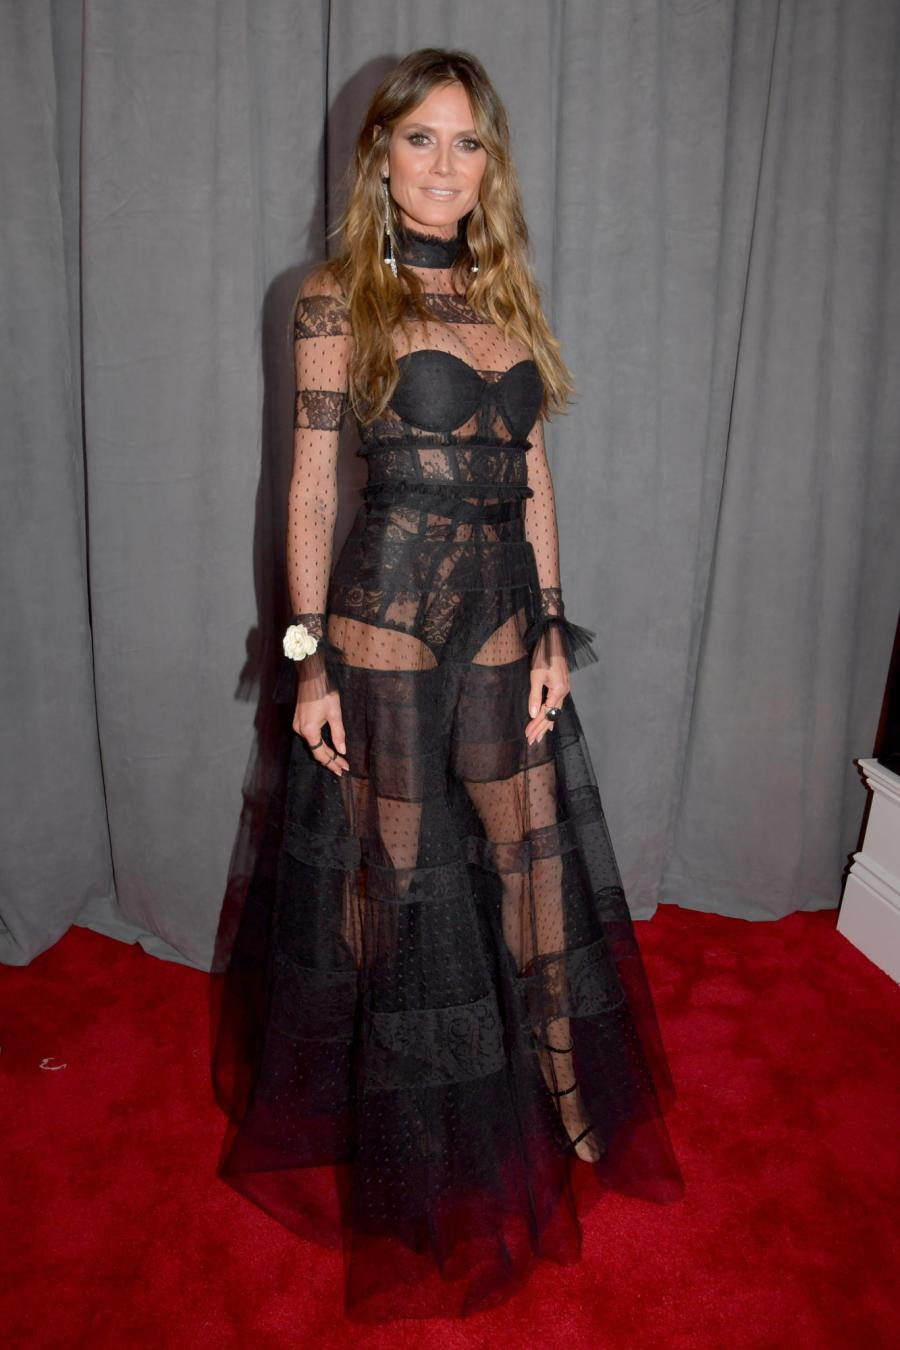 Heidi Klum in Ashi Couture - Red Carpet Grammy Award 2018